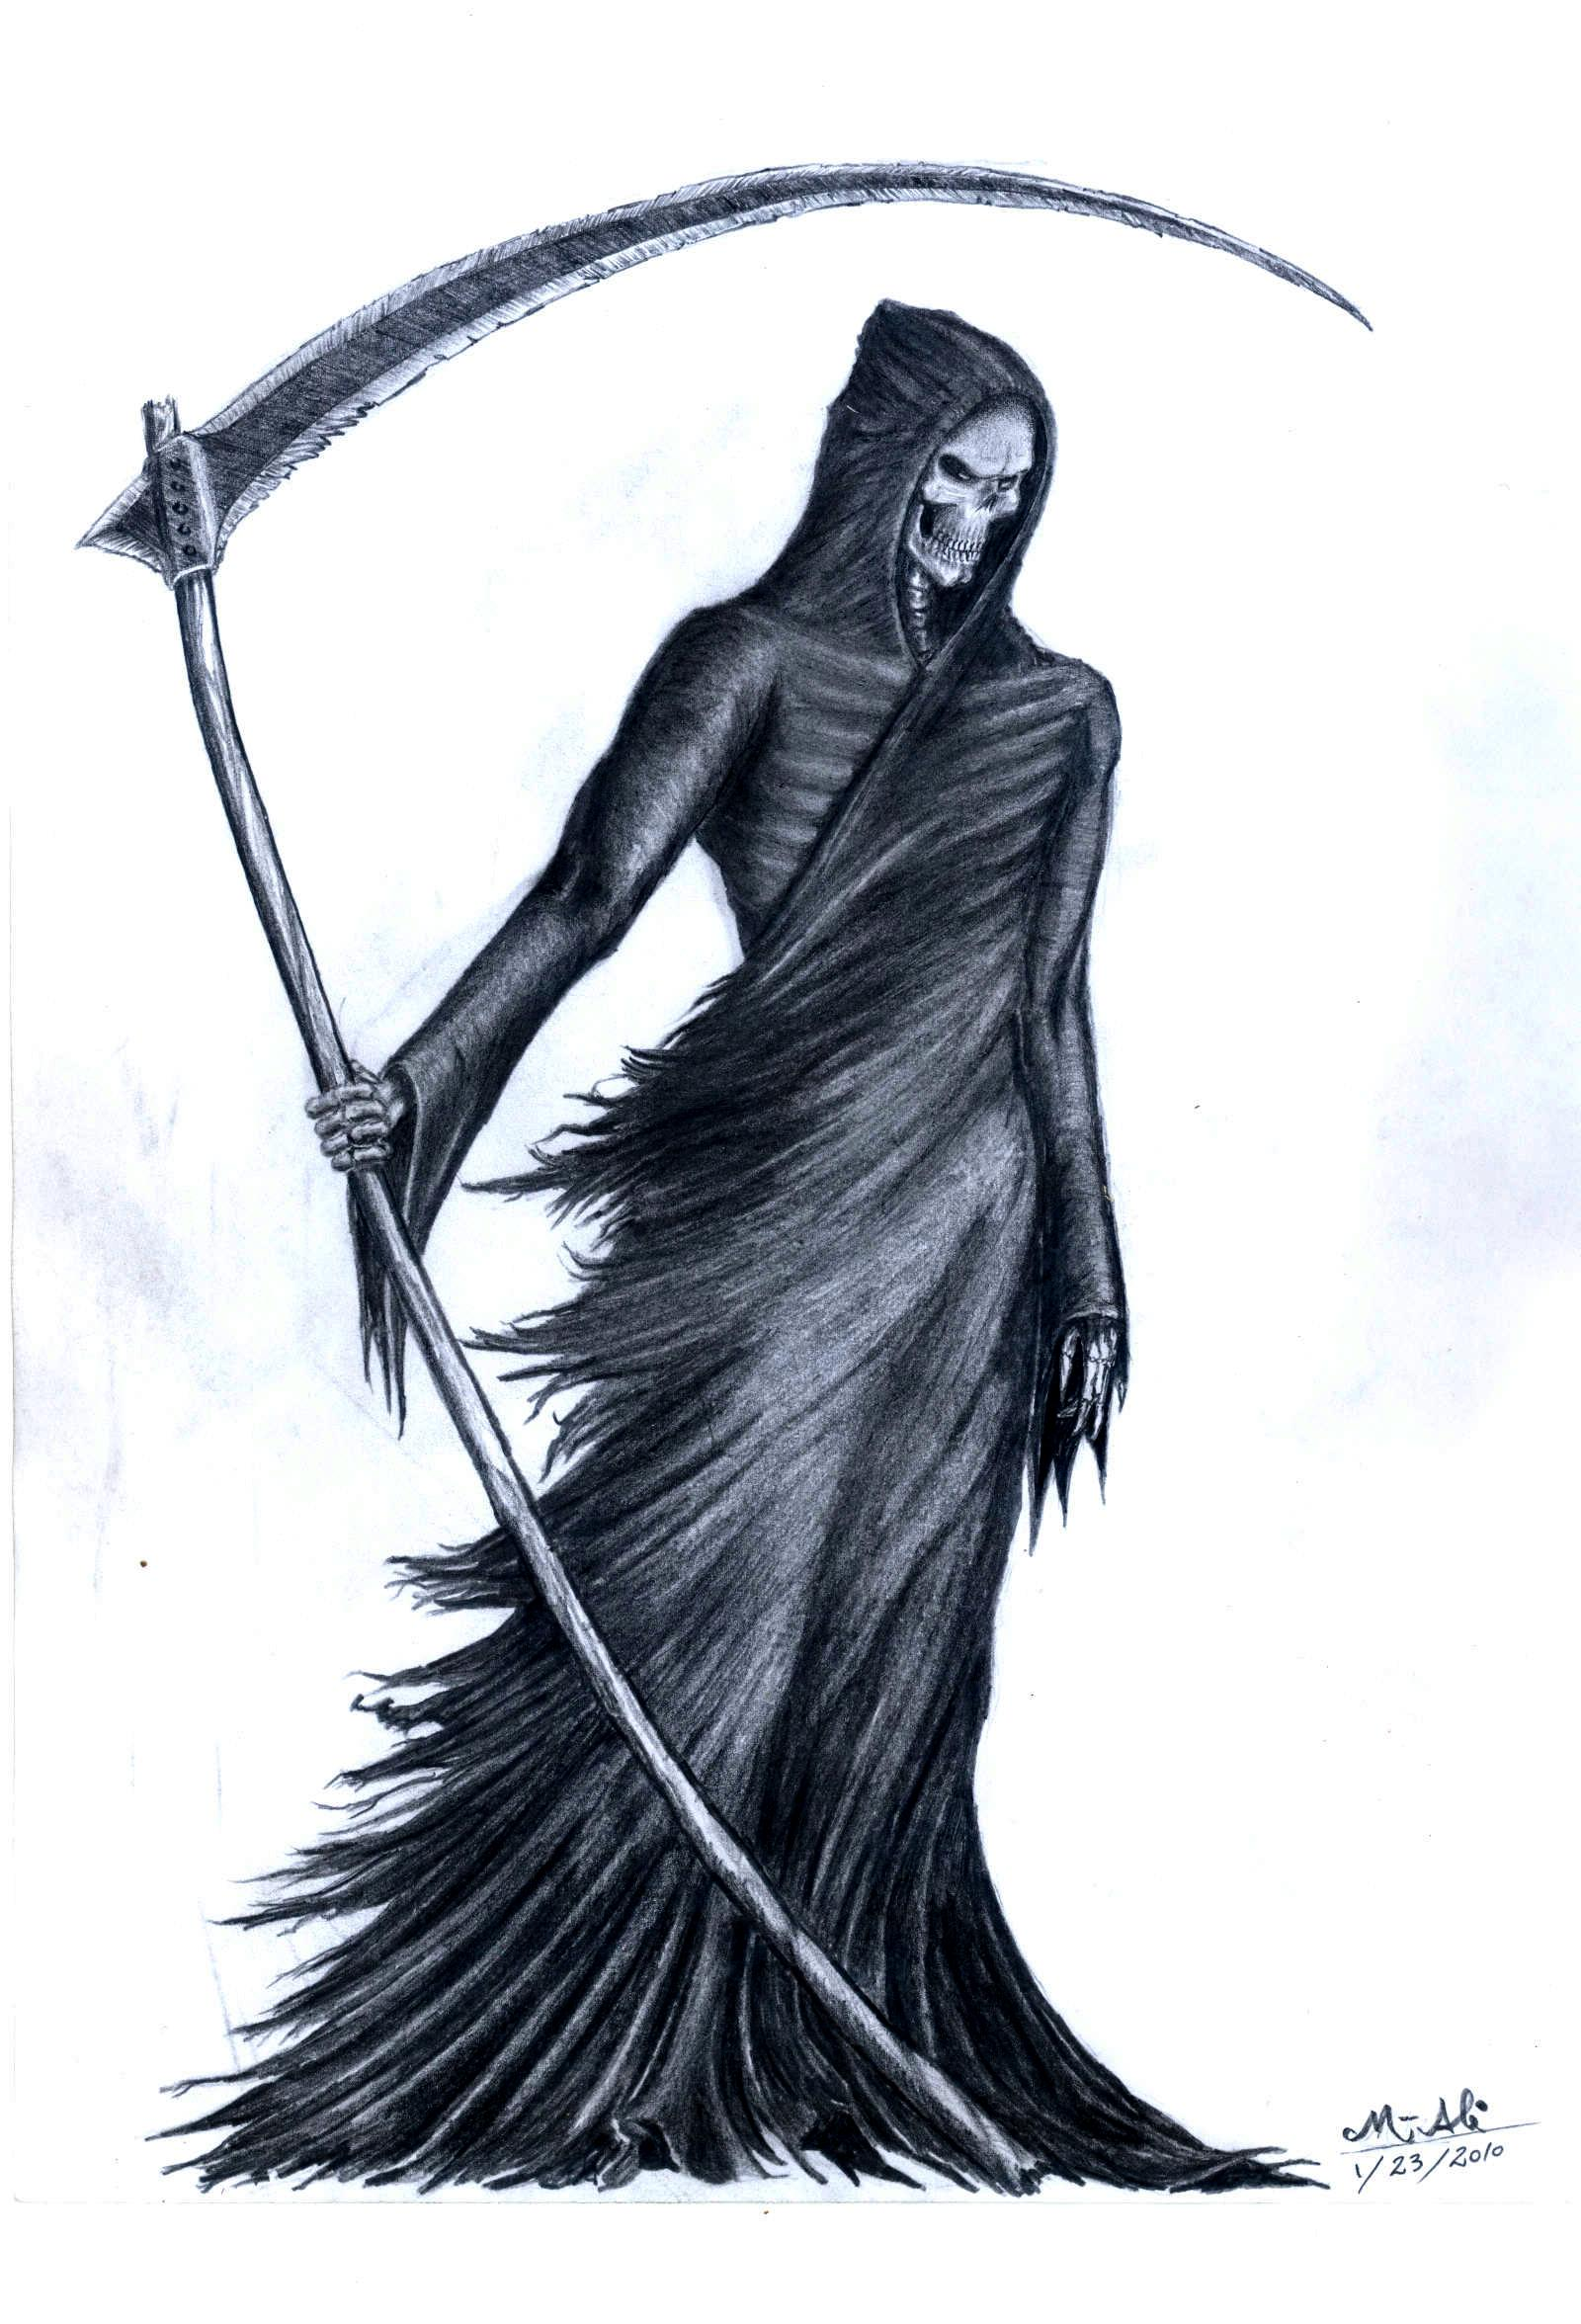 Grim Reaper by GrimShady on DeviantArt